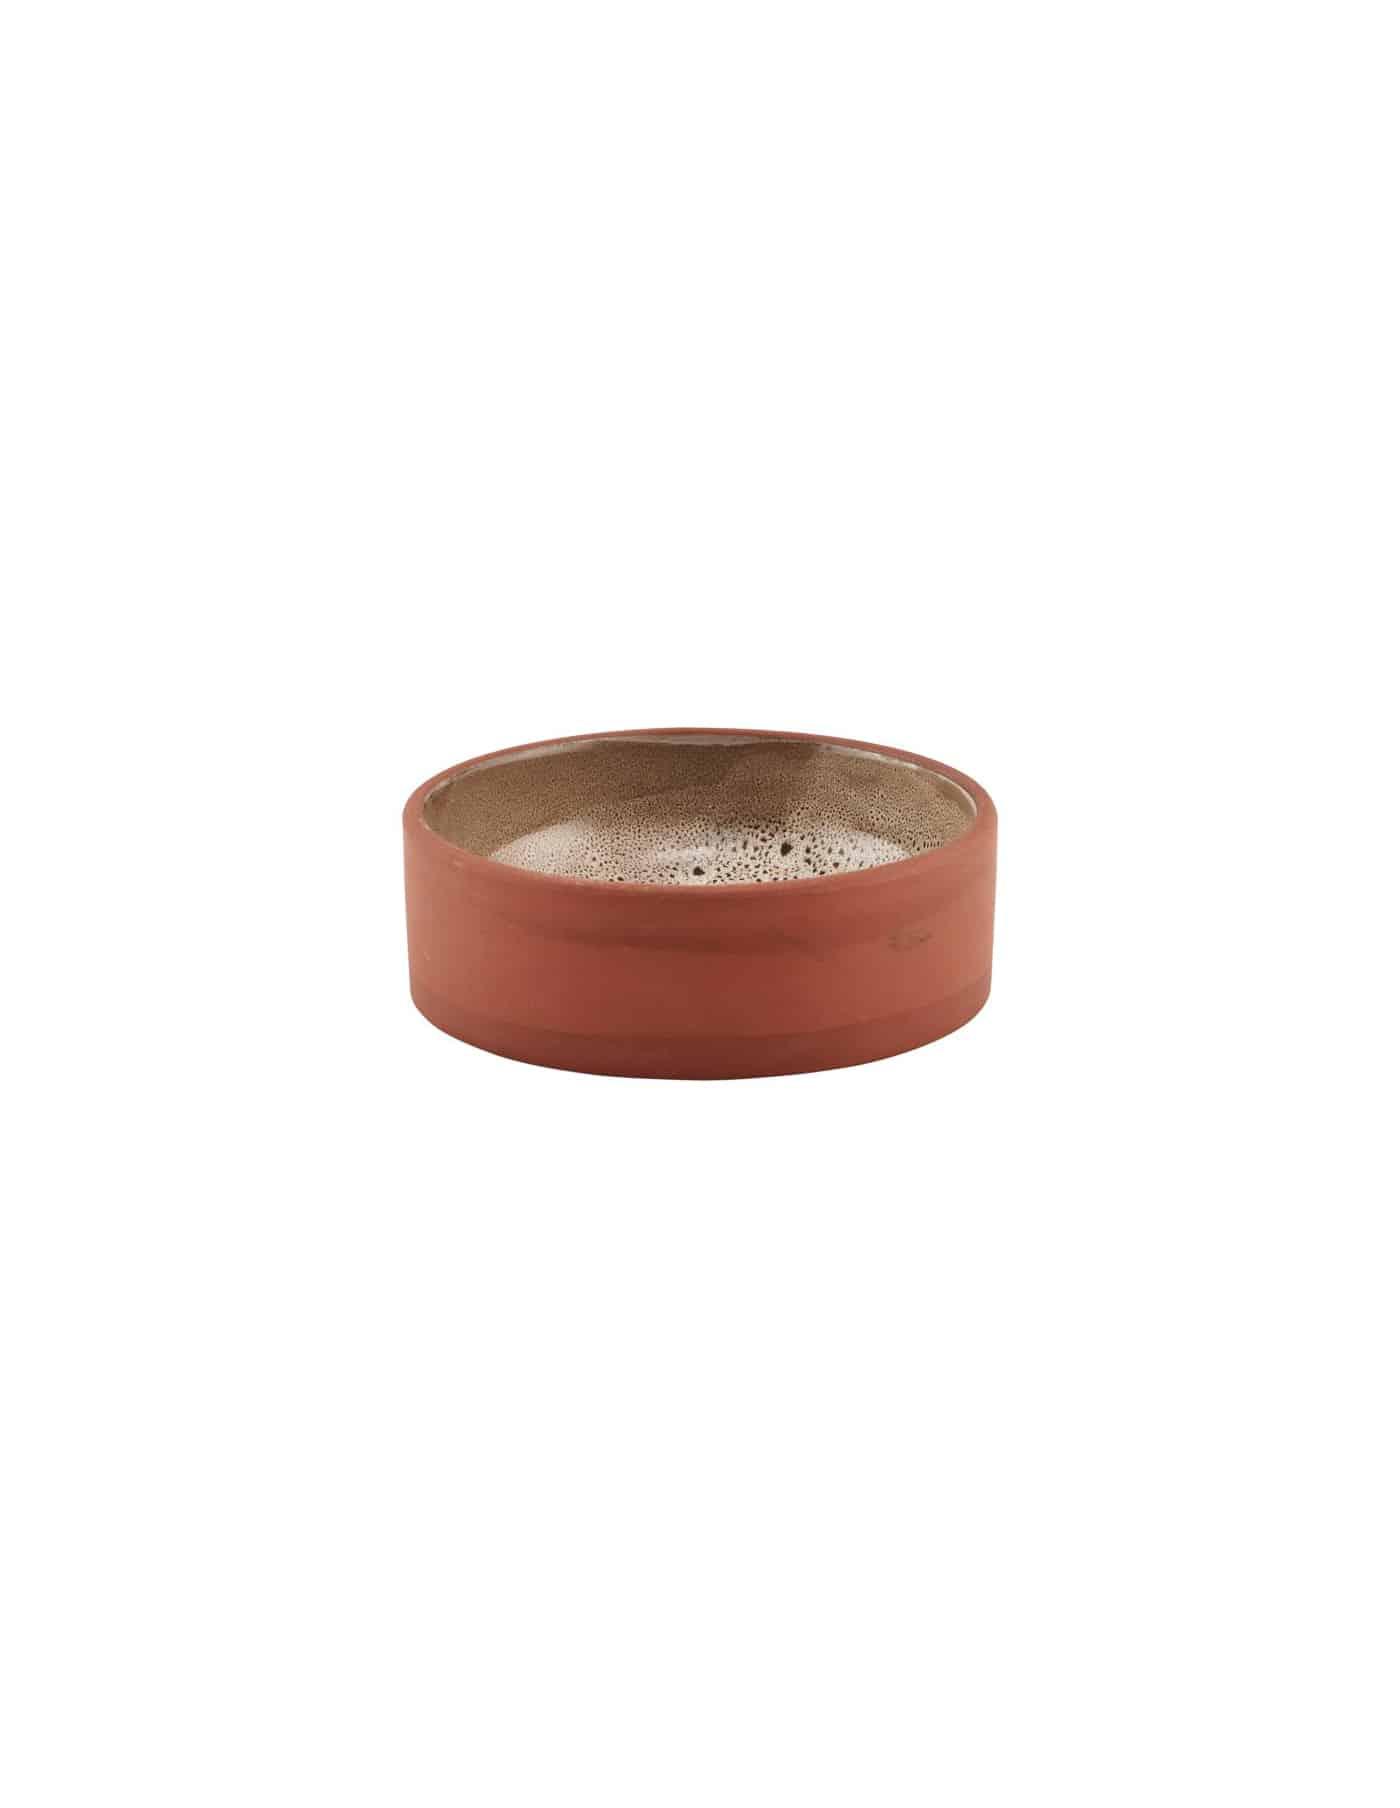 Medium Retro Terracotta Bowl, House Doctor